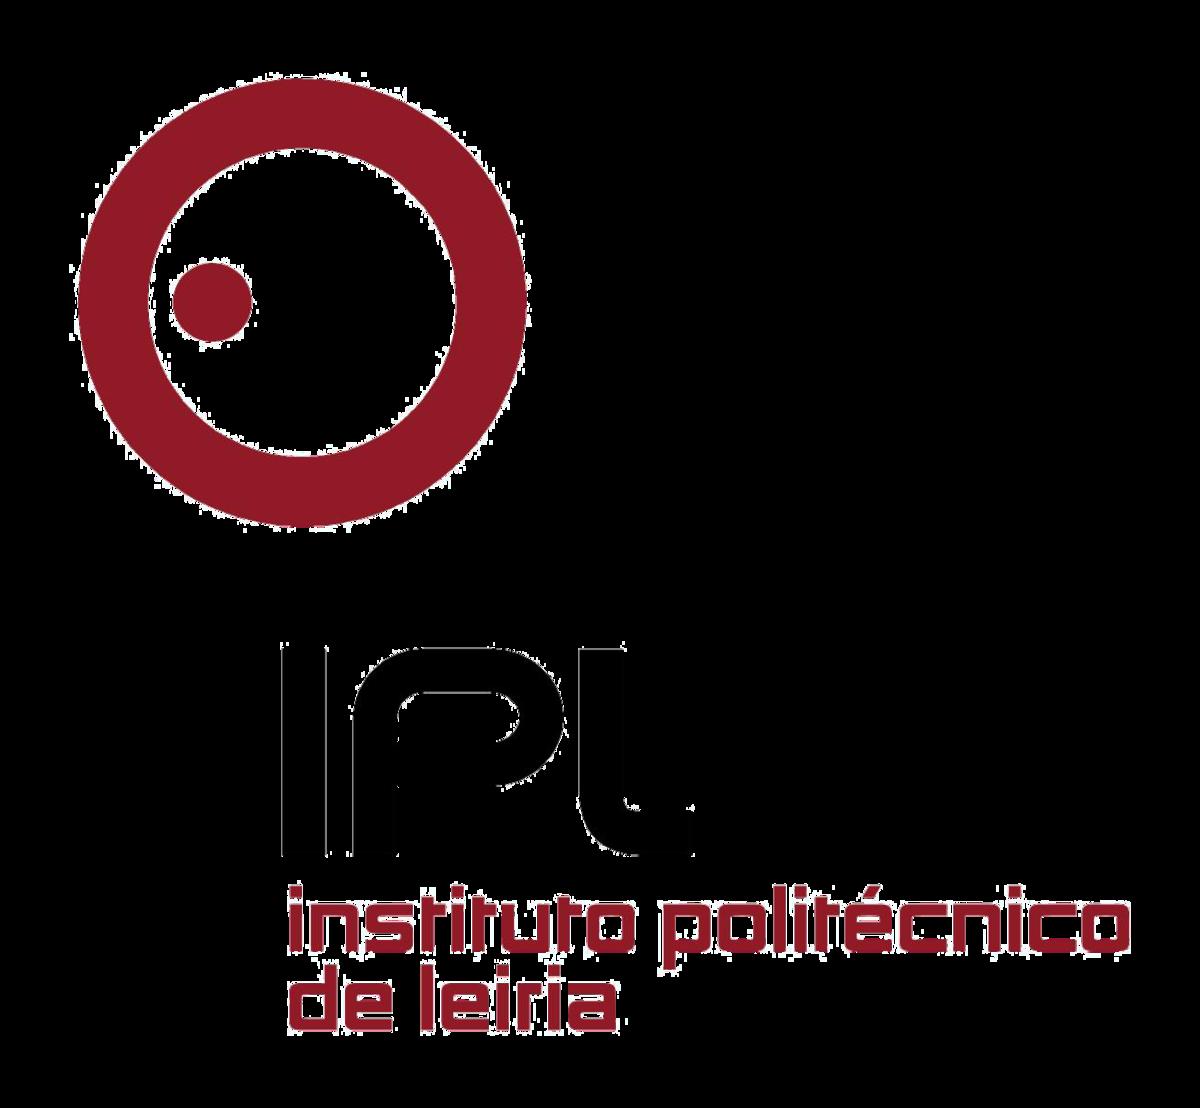 Polytechnic institute of leiria wikipedia for Politecnico design